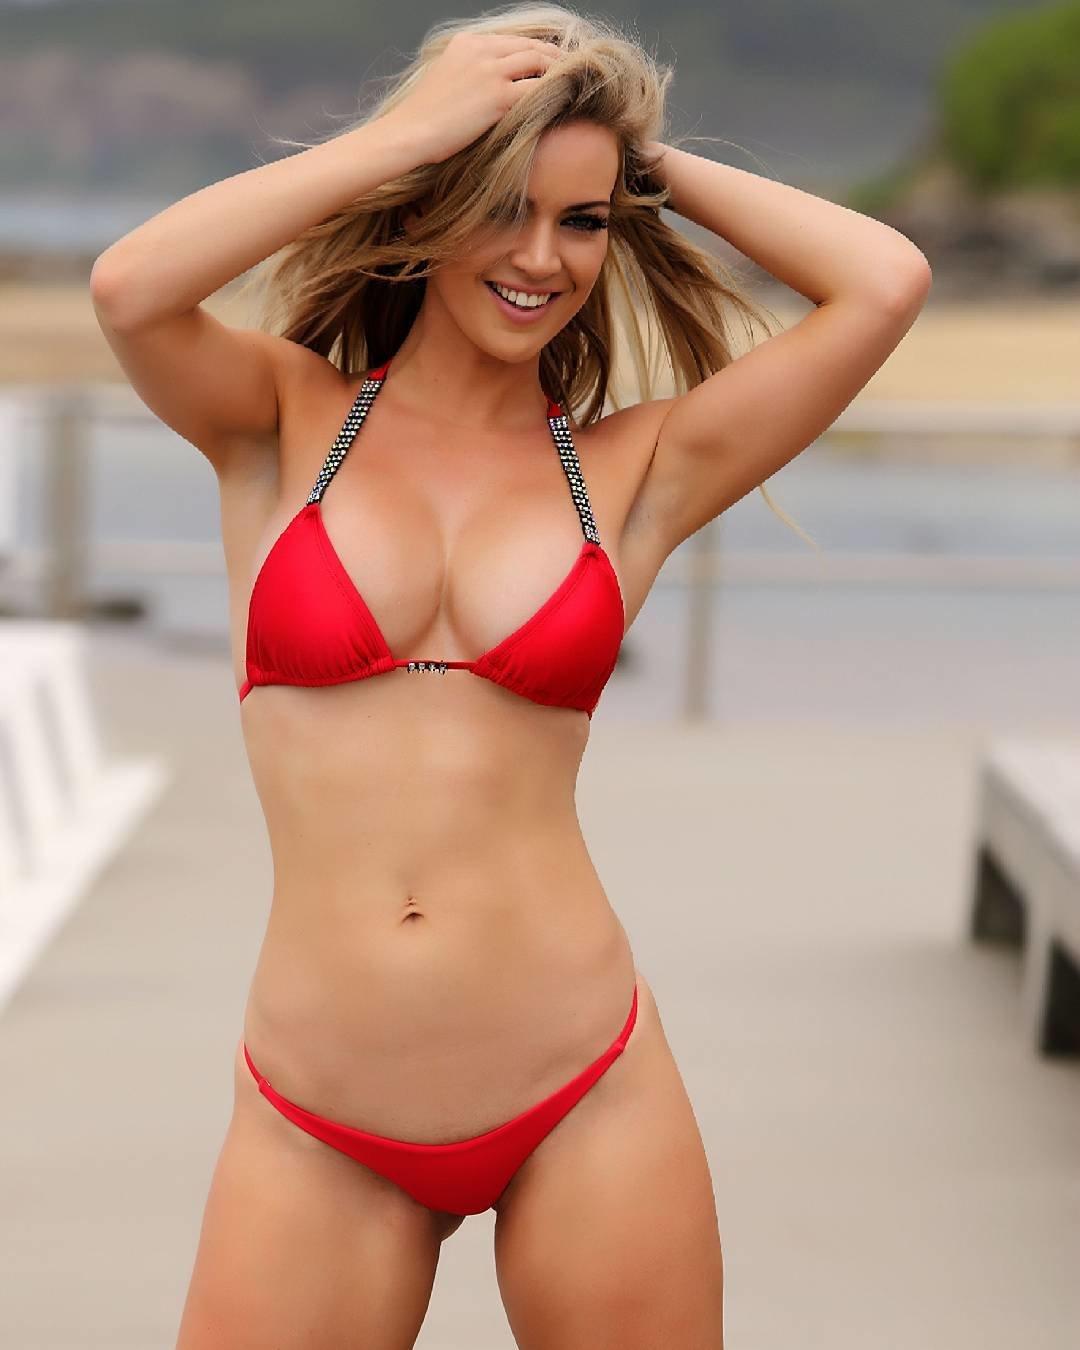 Bikini girls at lambeau